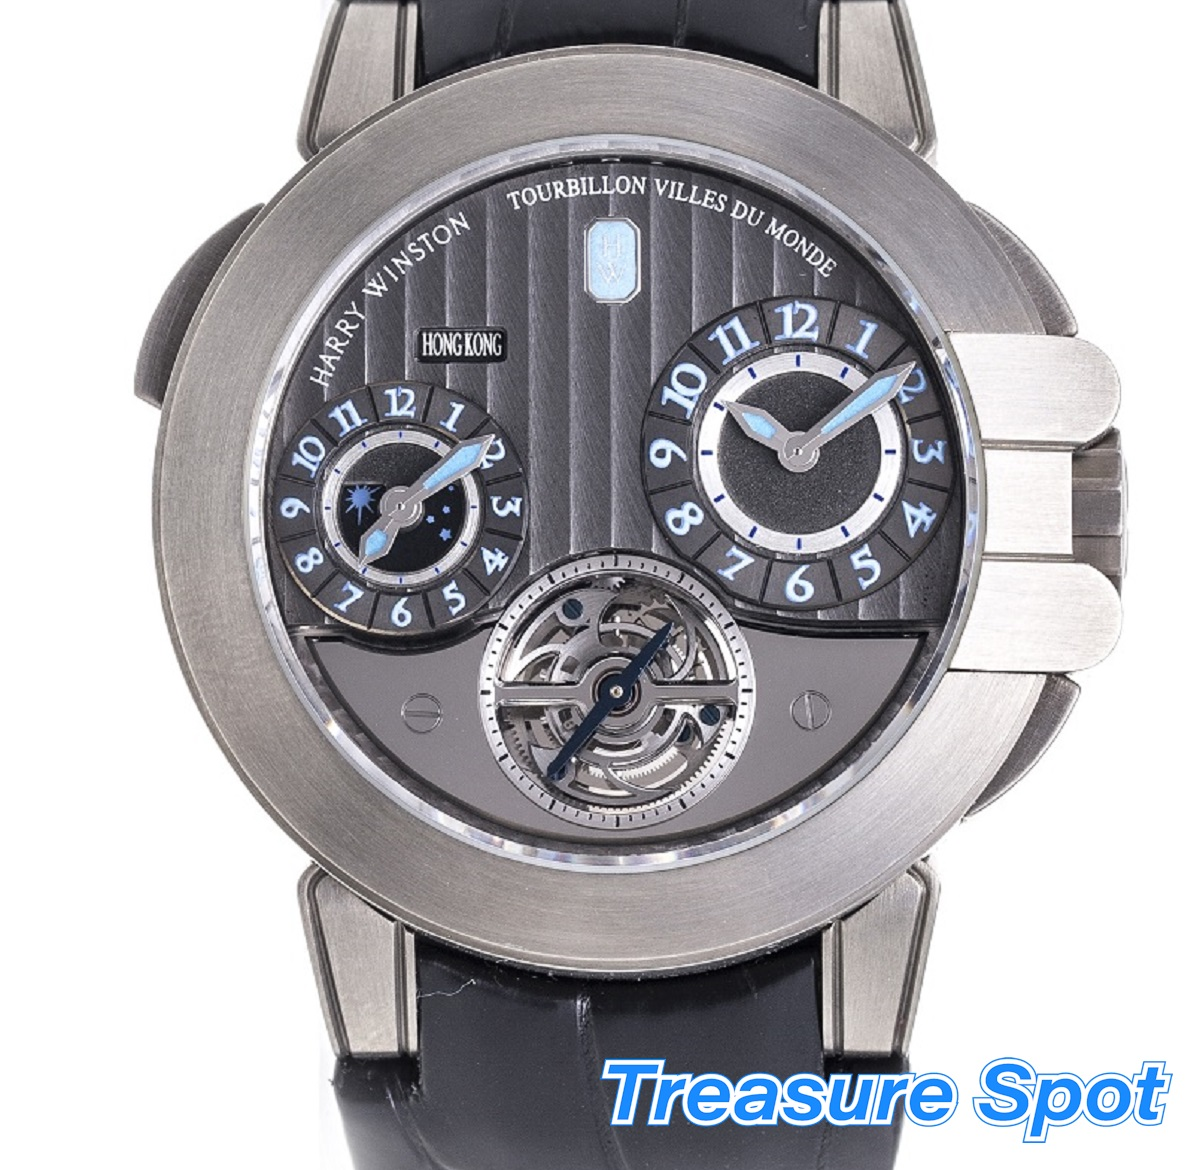 HARRY WINSTON ハリー・ウィンストン オーシャン プロジェクトZ5 GMT トゥールビヨン OCEATG45ZZ001 ザリウム 自動巻き メンズ 腕時計 送料無料 【トレジャースポット】【中古】